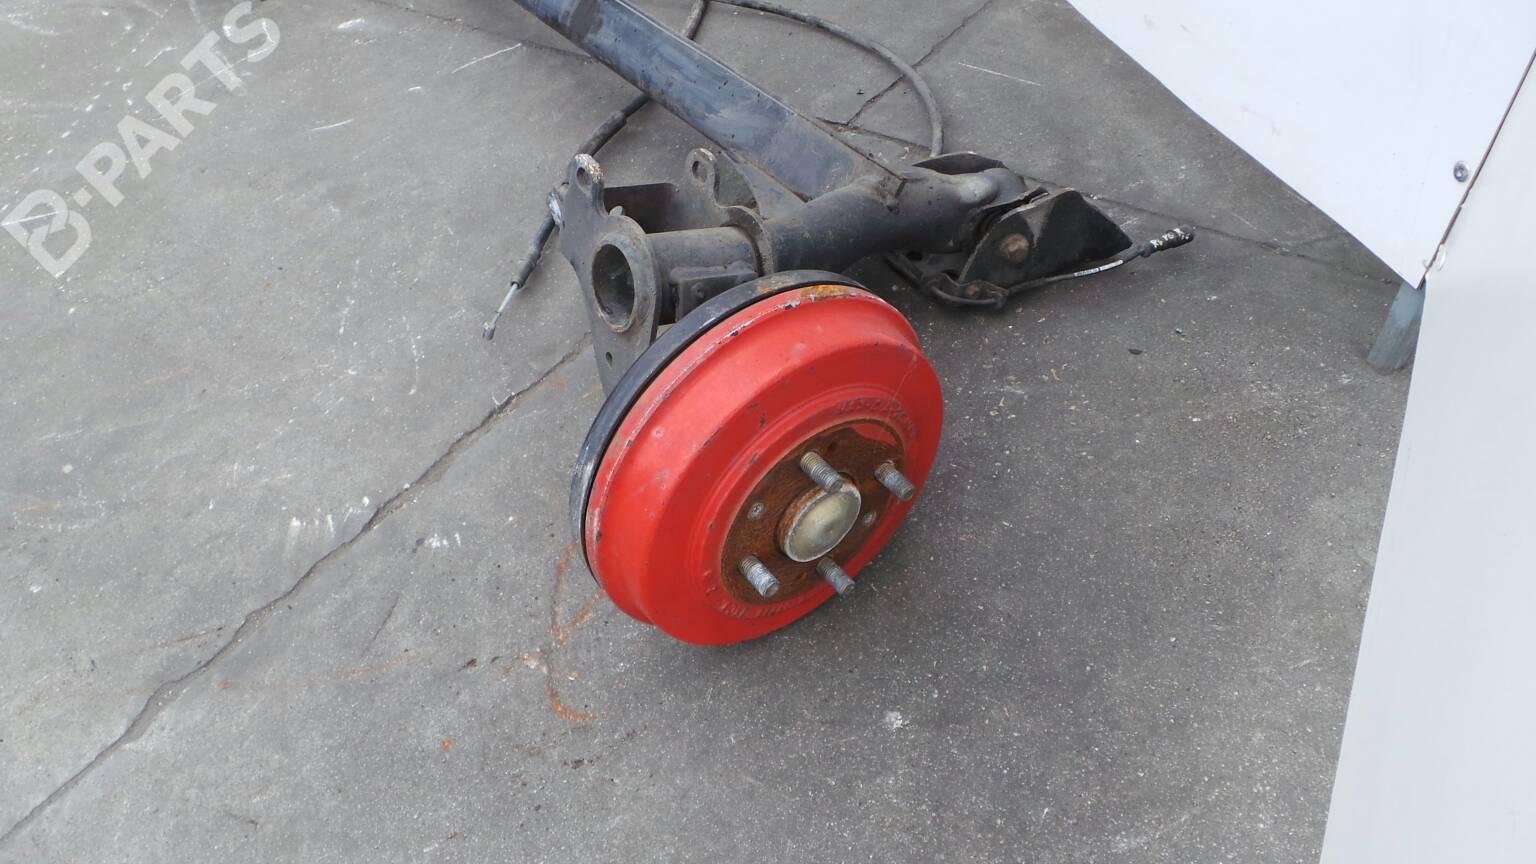 Rear Axle Mg Zr 105 37983 Fuse Box For 1053 Doors 103hp 14 K4f